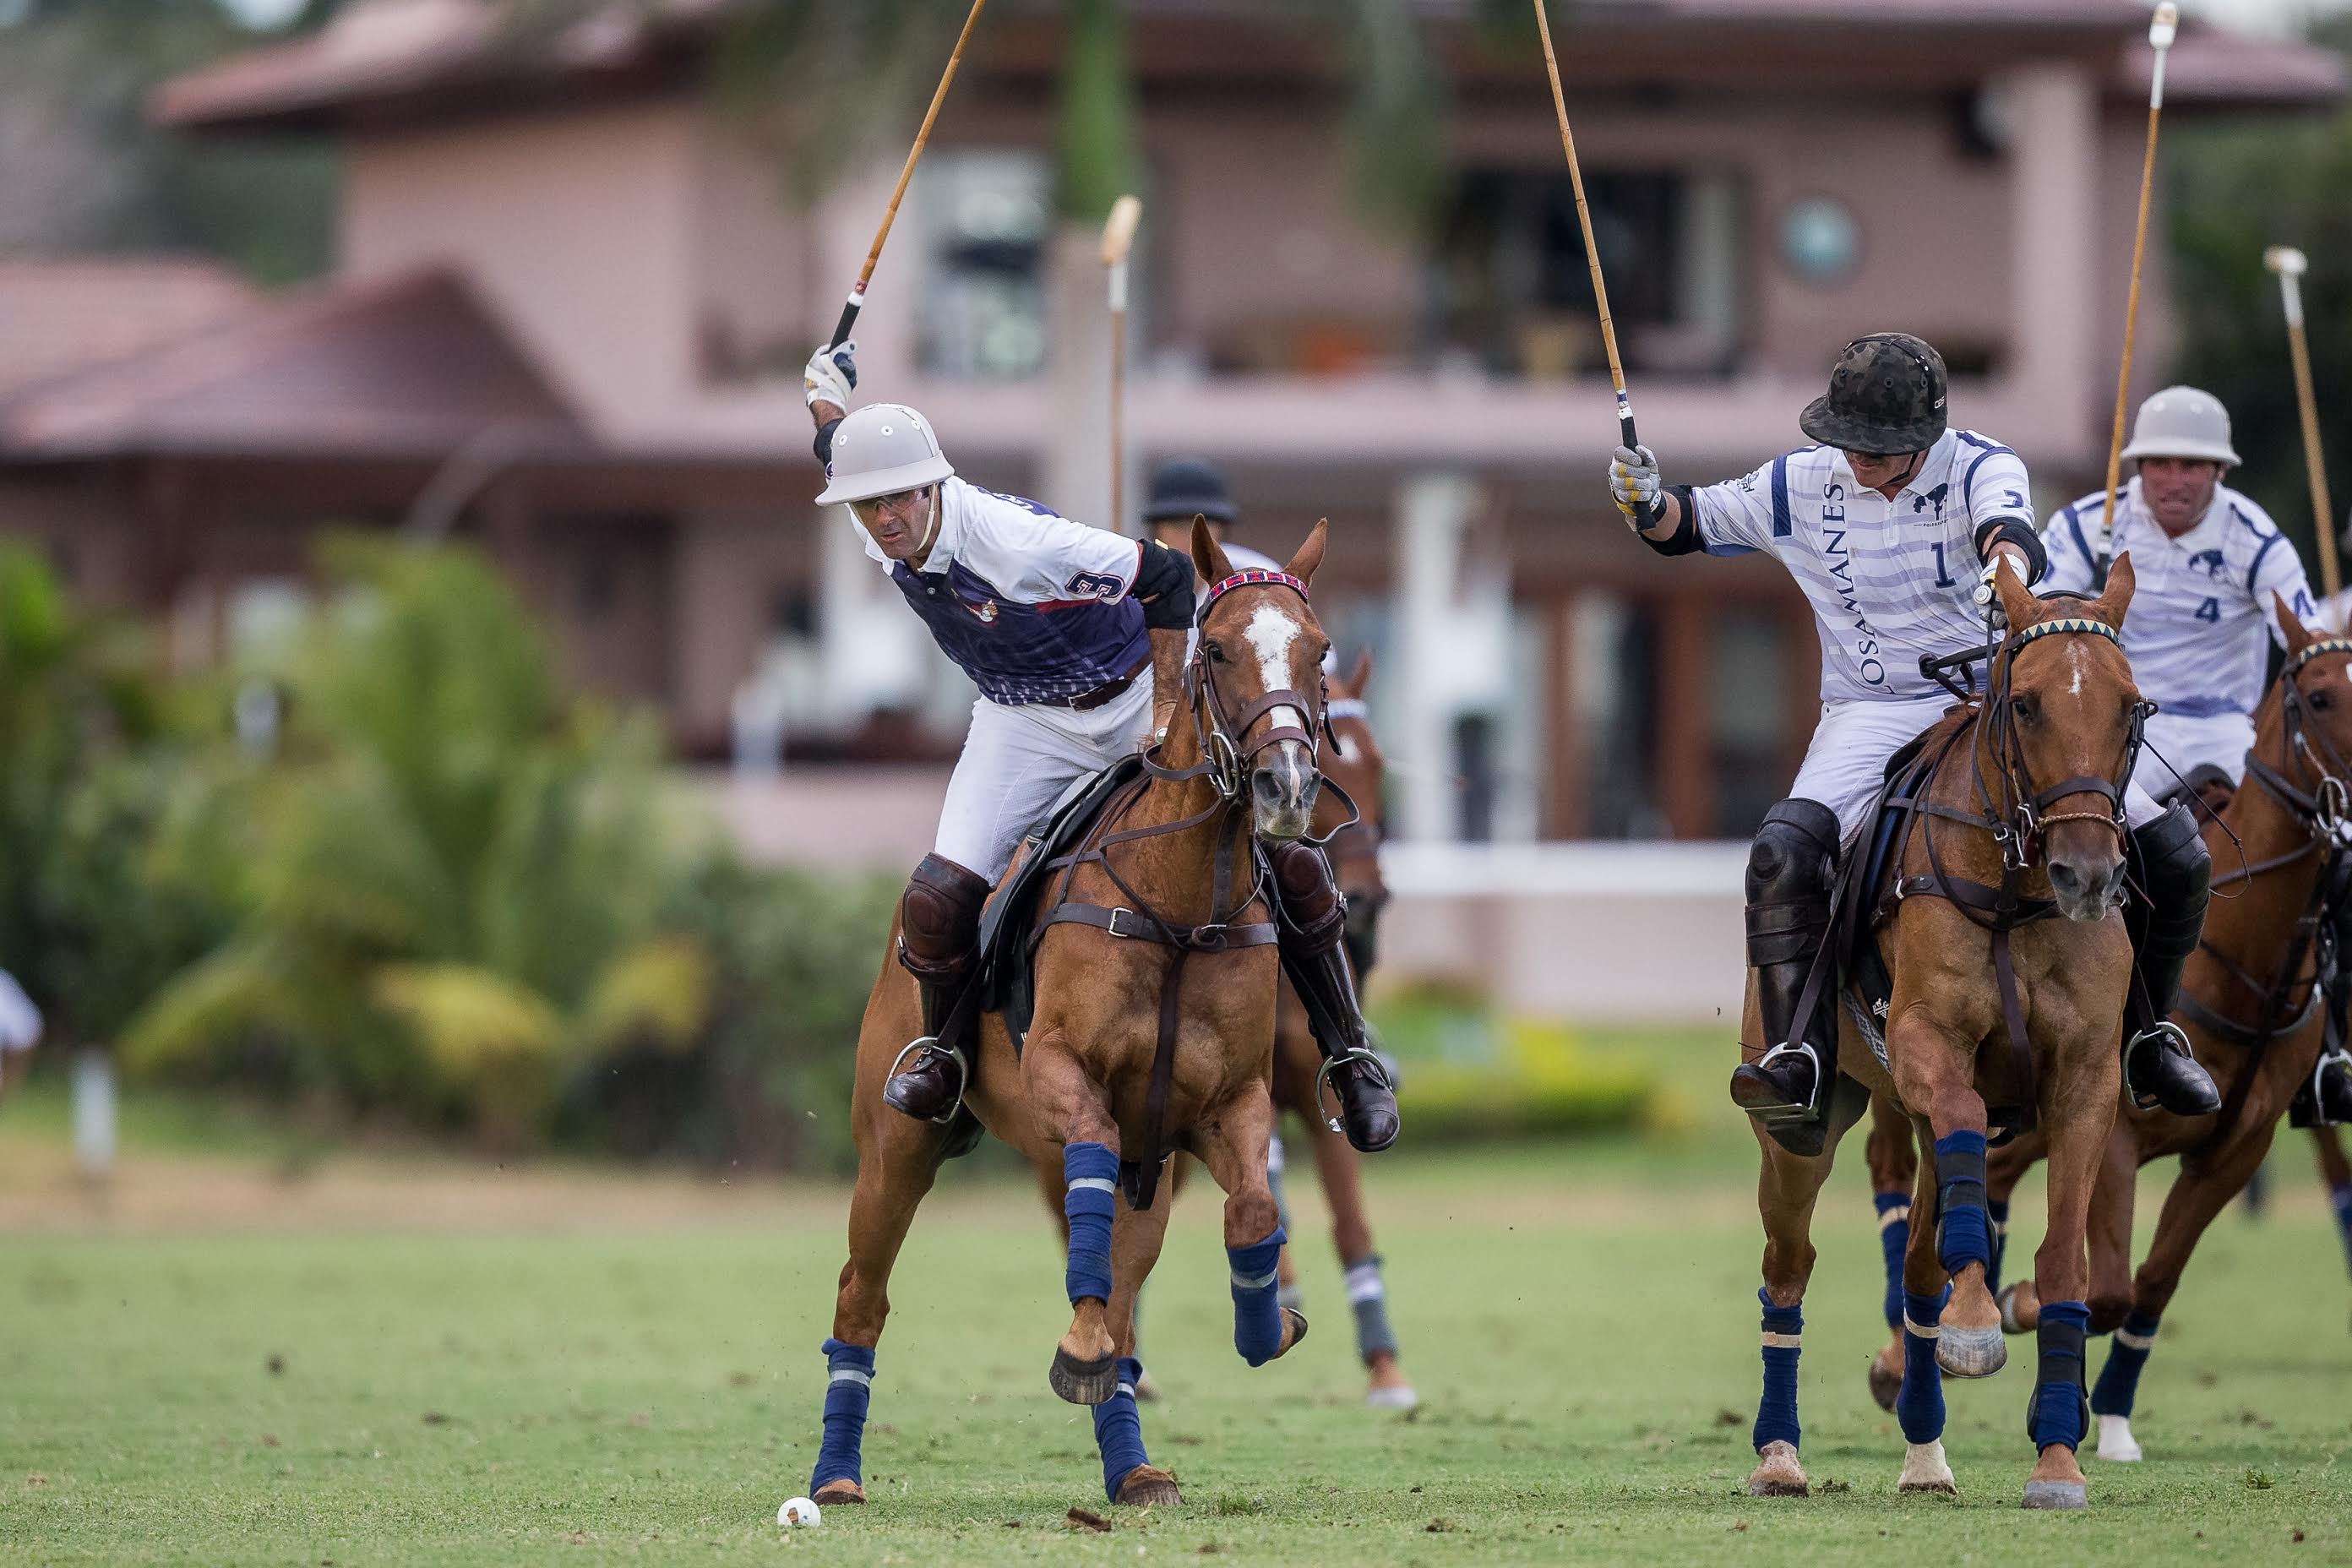 Los Samanes vs. Lechuza Polo Challenge 2016 RD